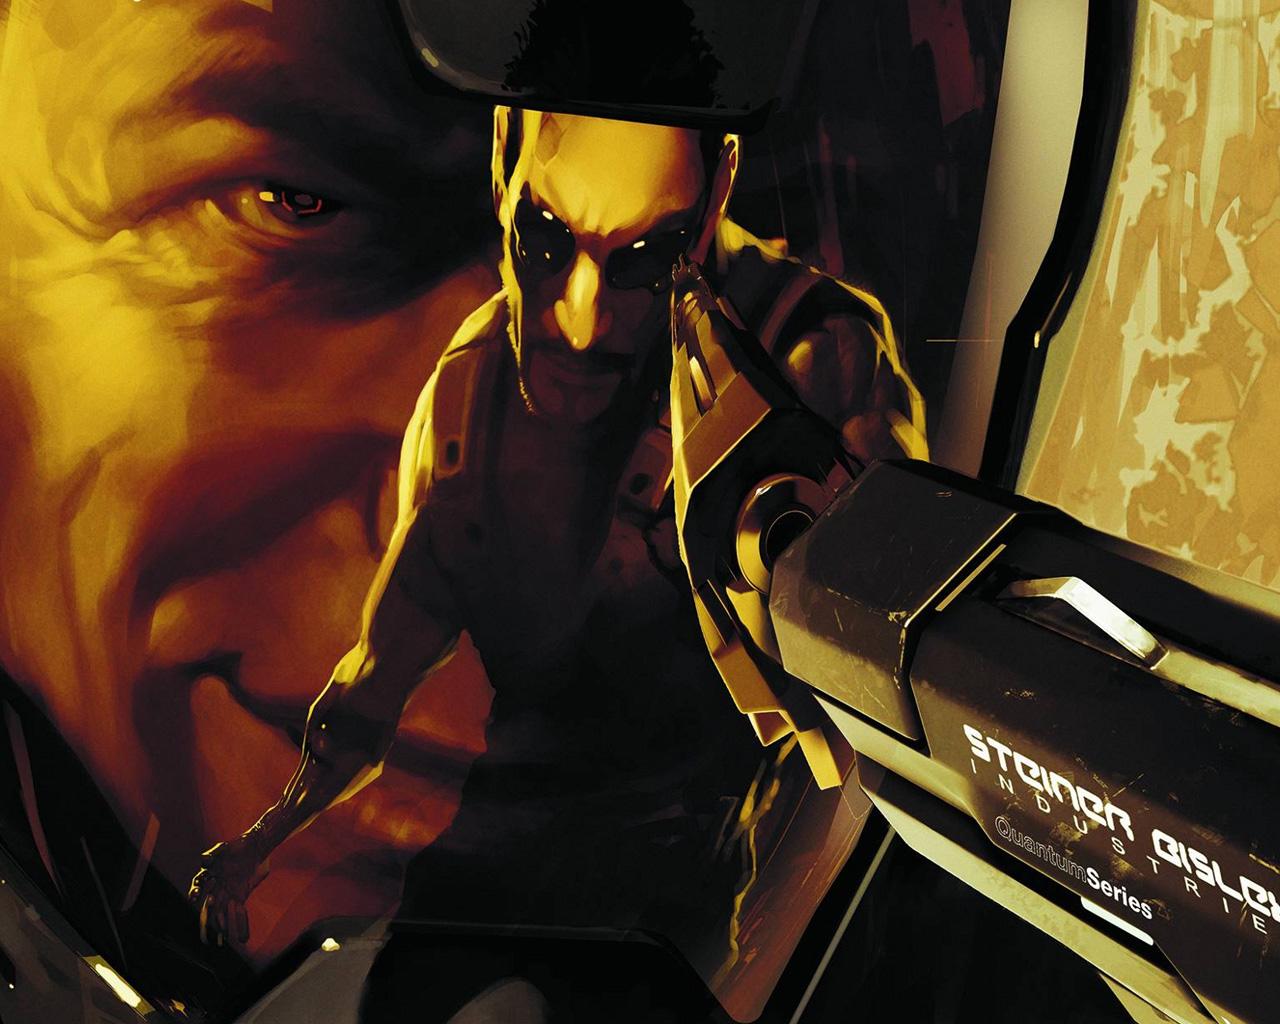 Free Deus Ex: Human Revolution Wallpaper in 1280x1024